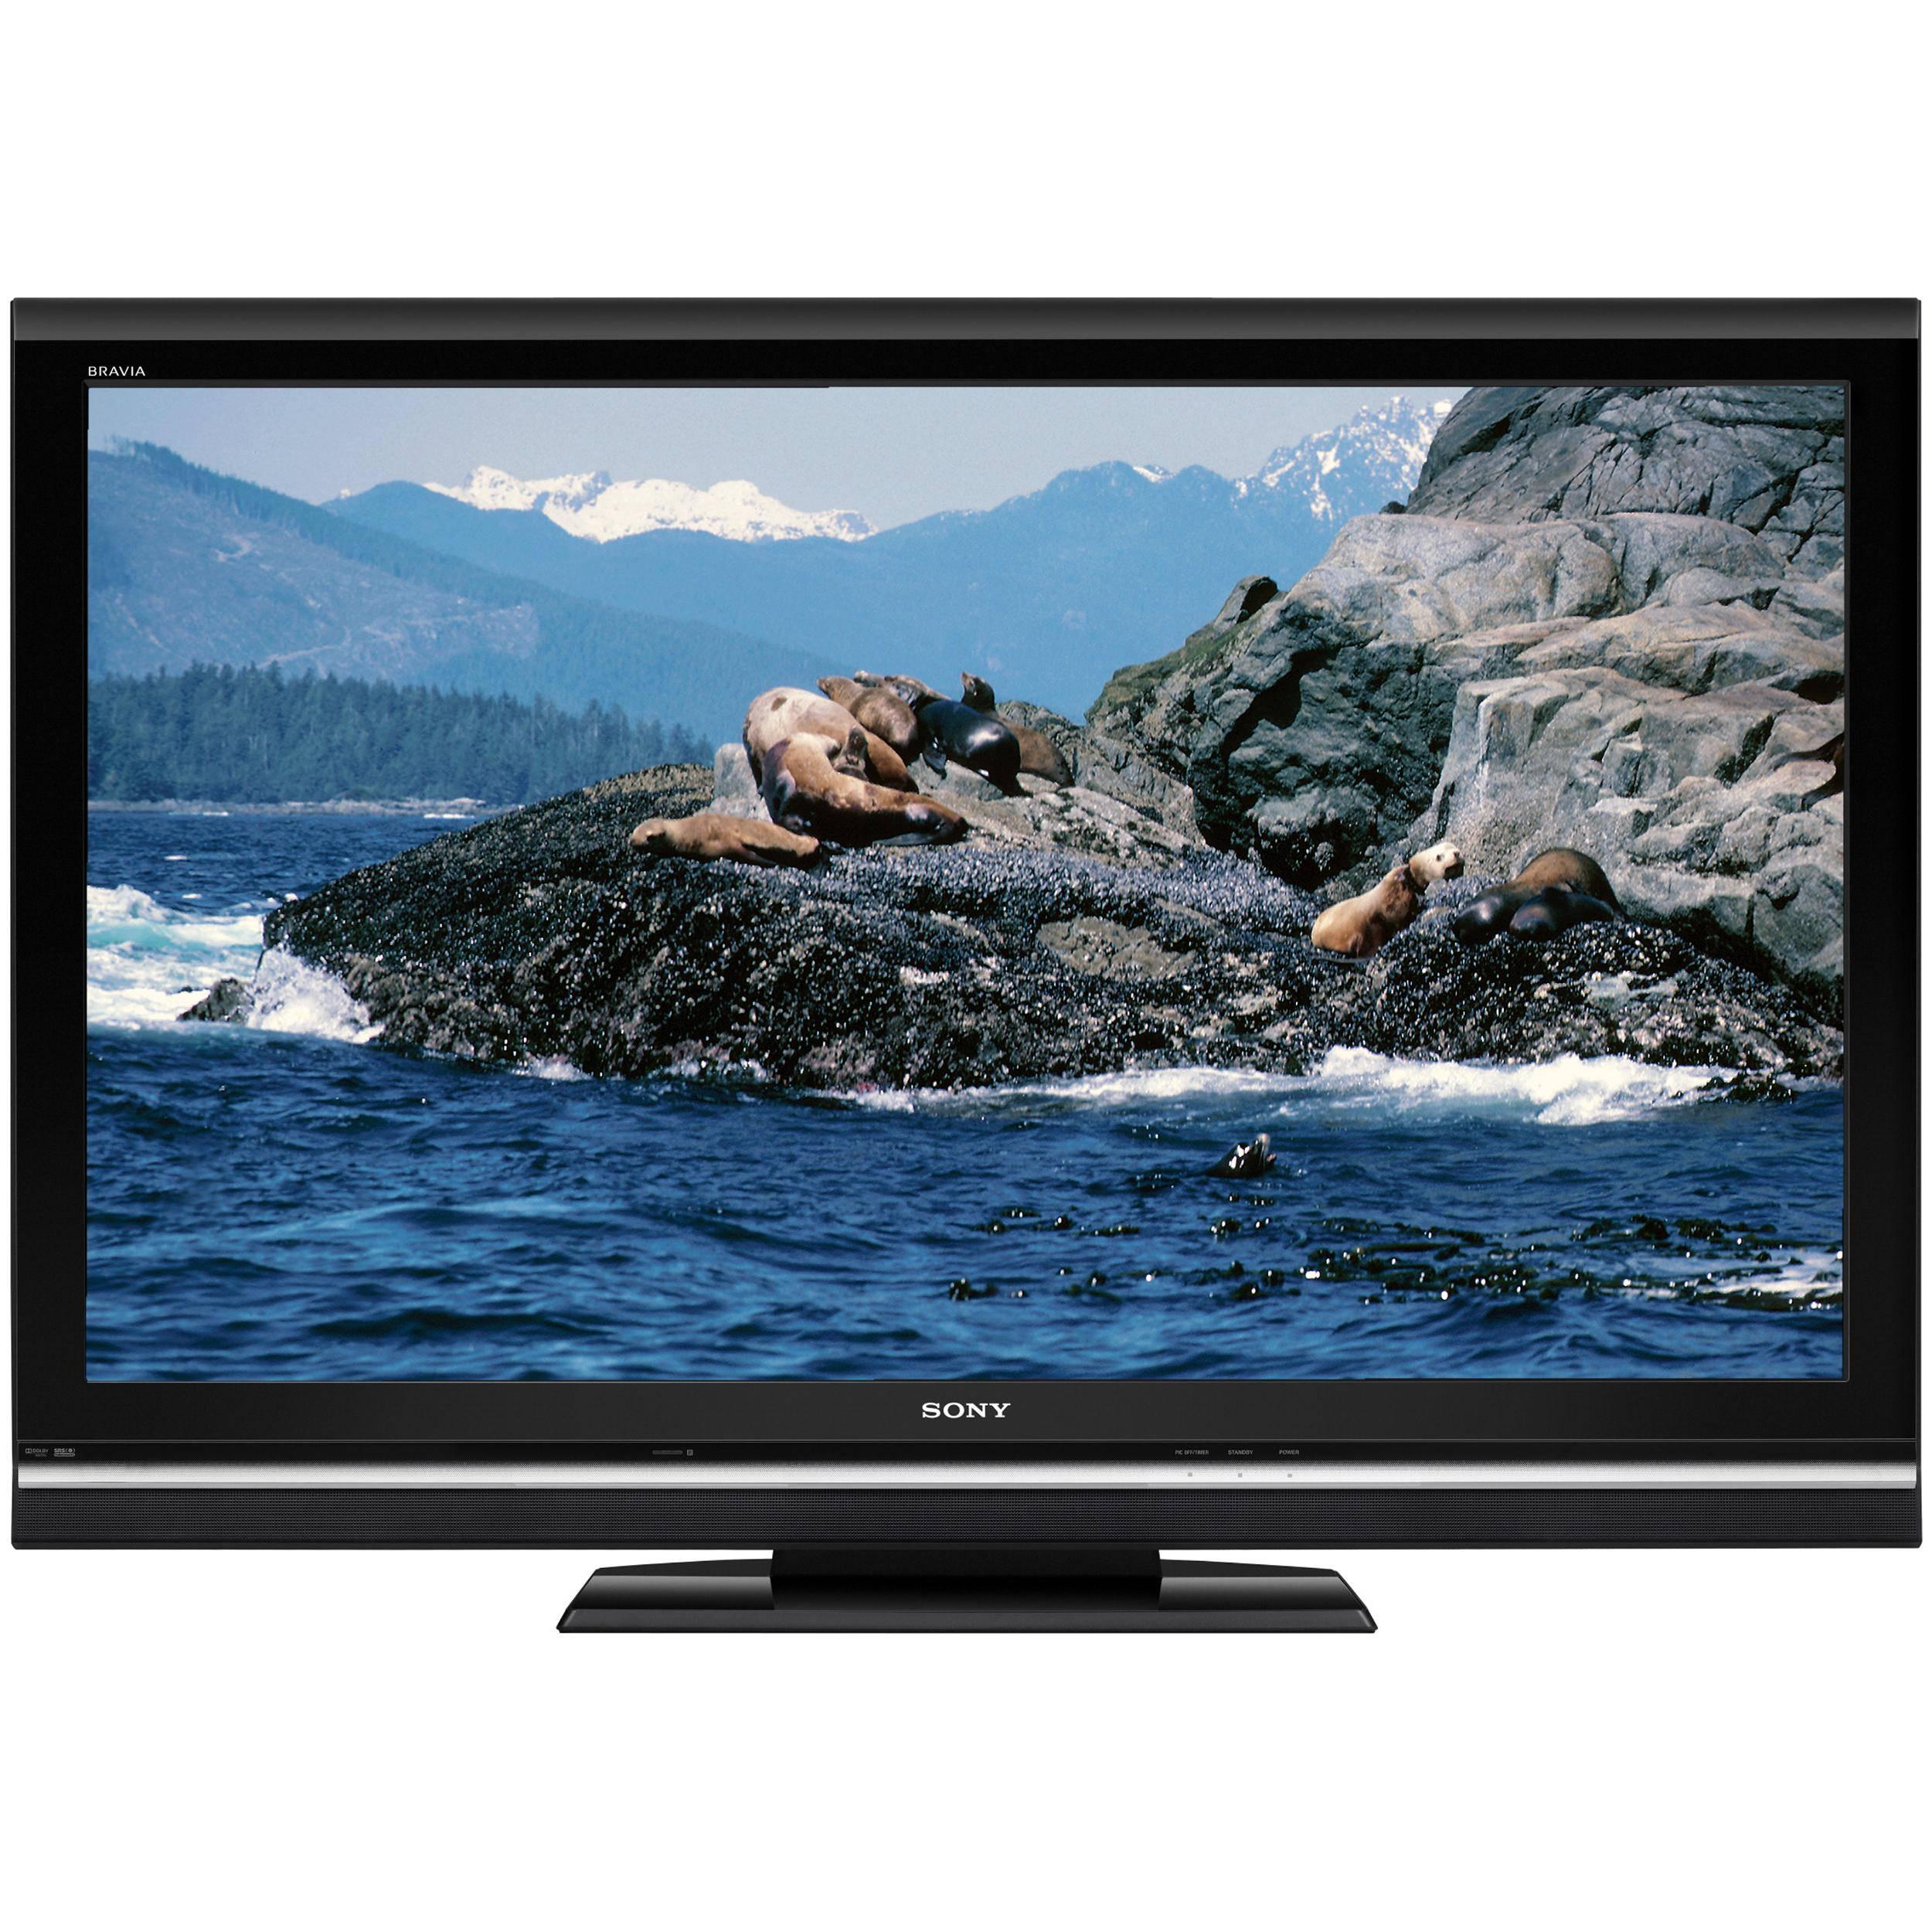 Sony KDL-40HX75A BRAVIA HDTV Drivers Windows